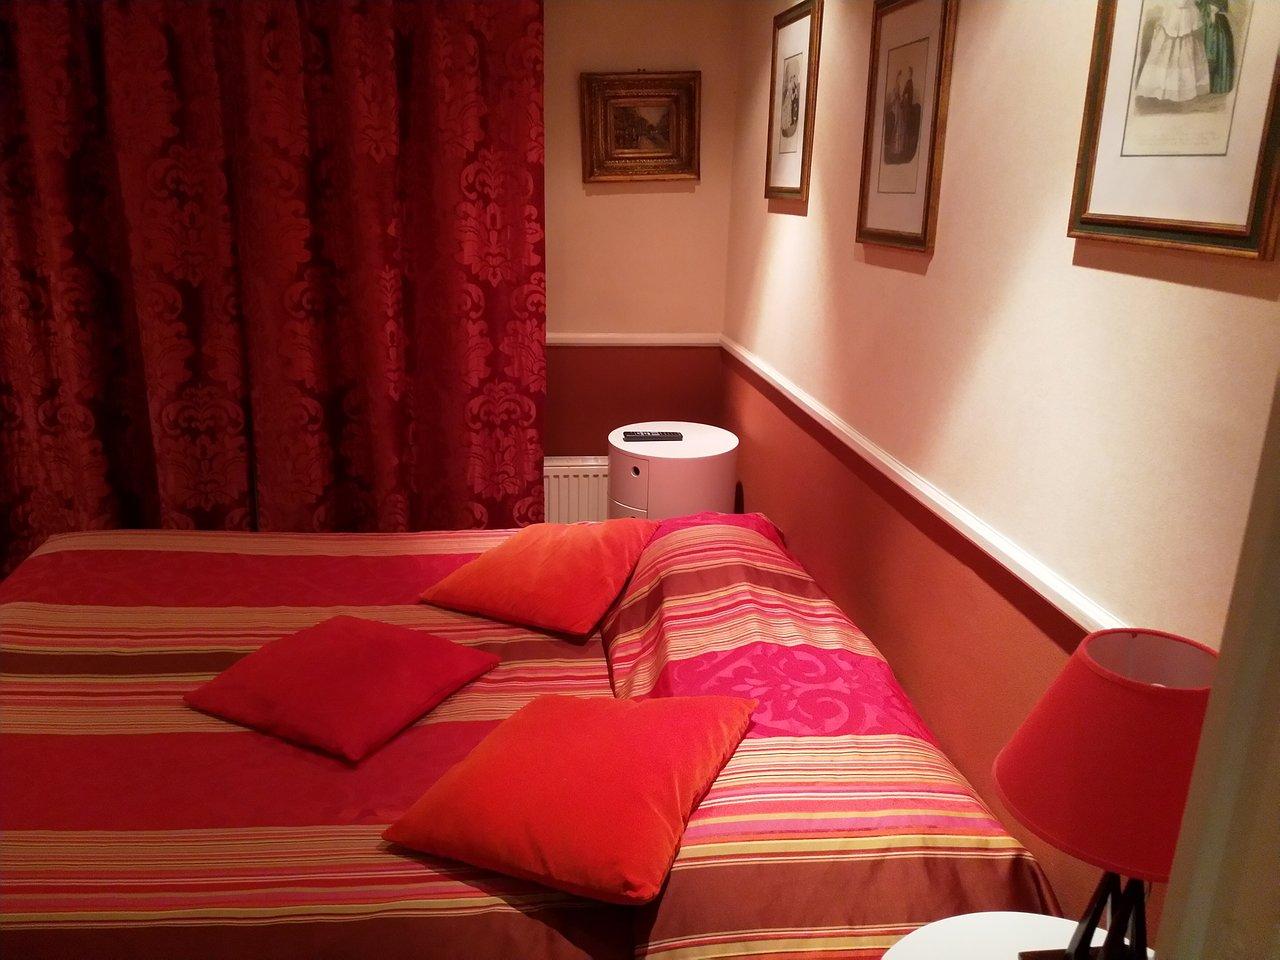 hotel des arts updated 2019 prices reviews paris france rh tripadvisor com